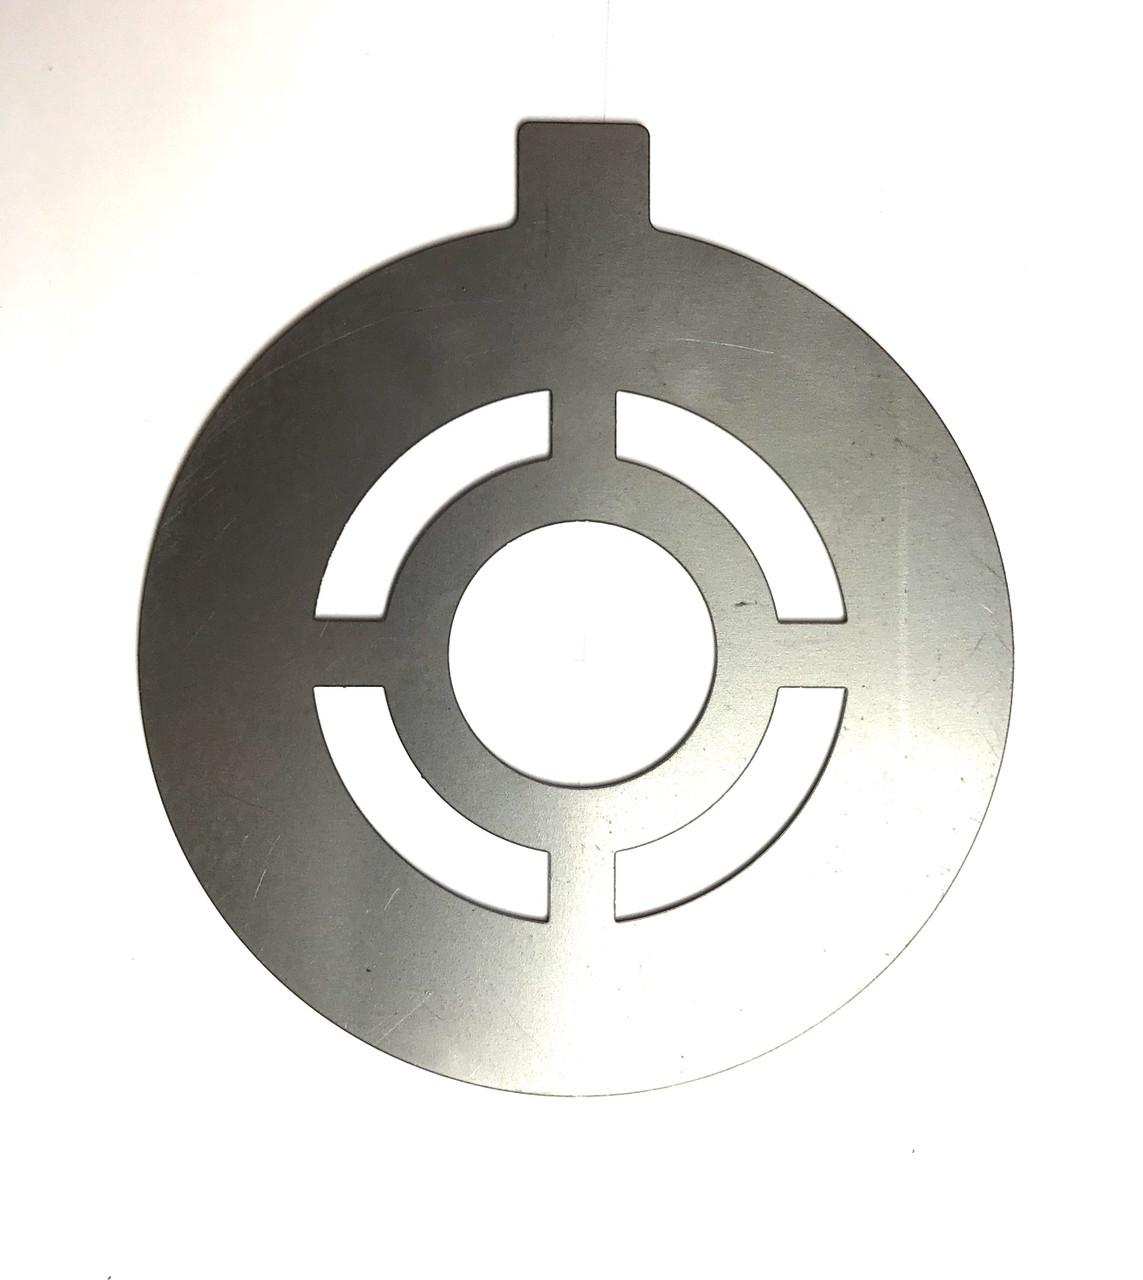 Universal Bullseye Stencil